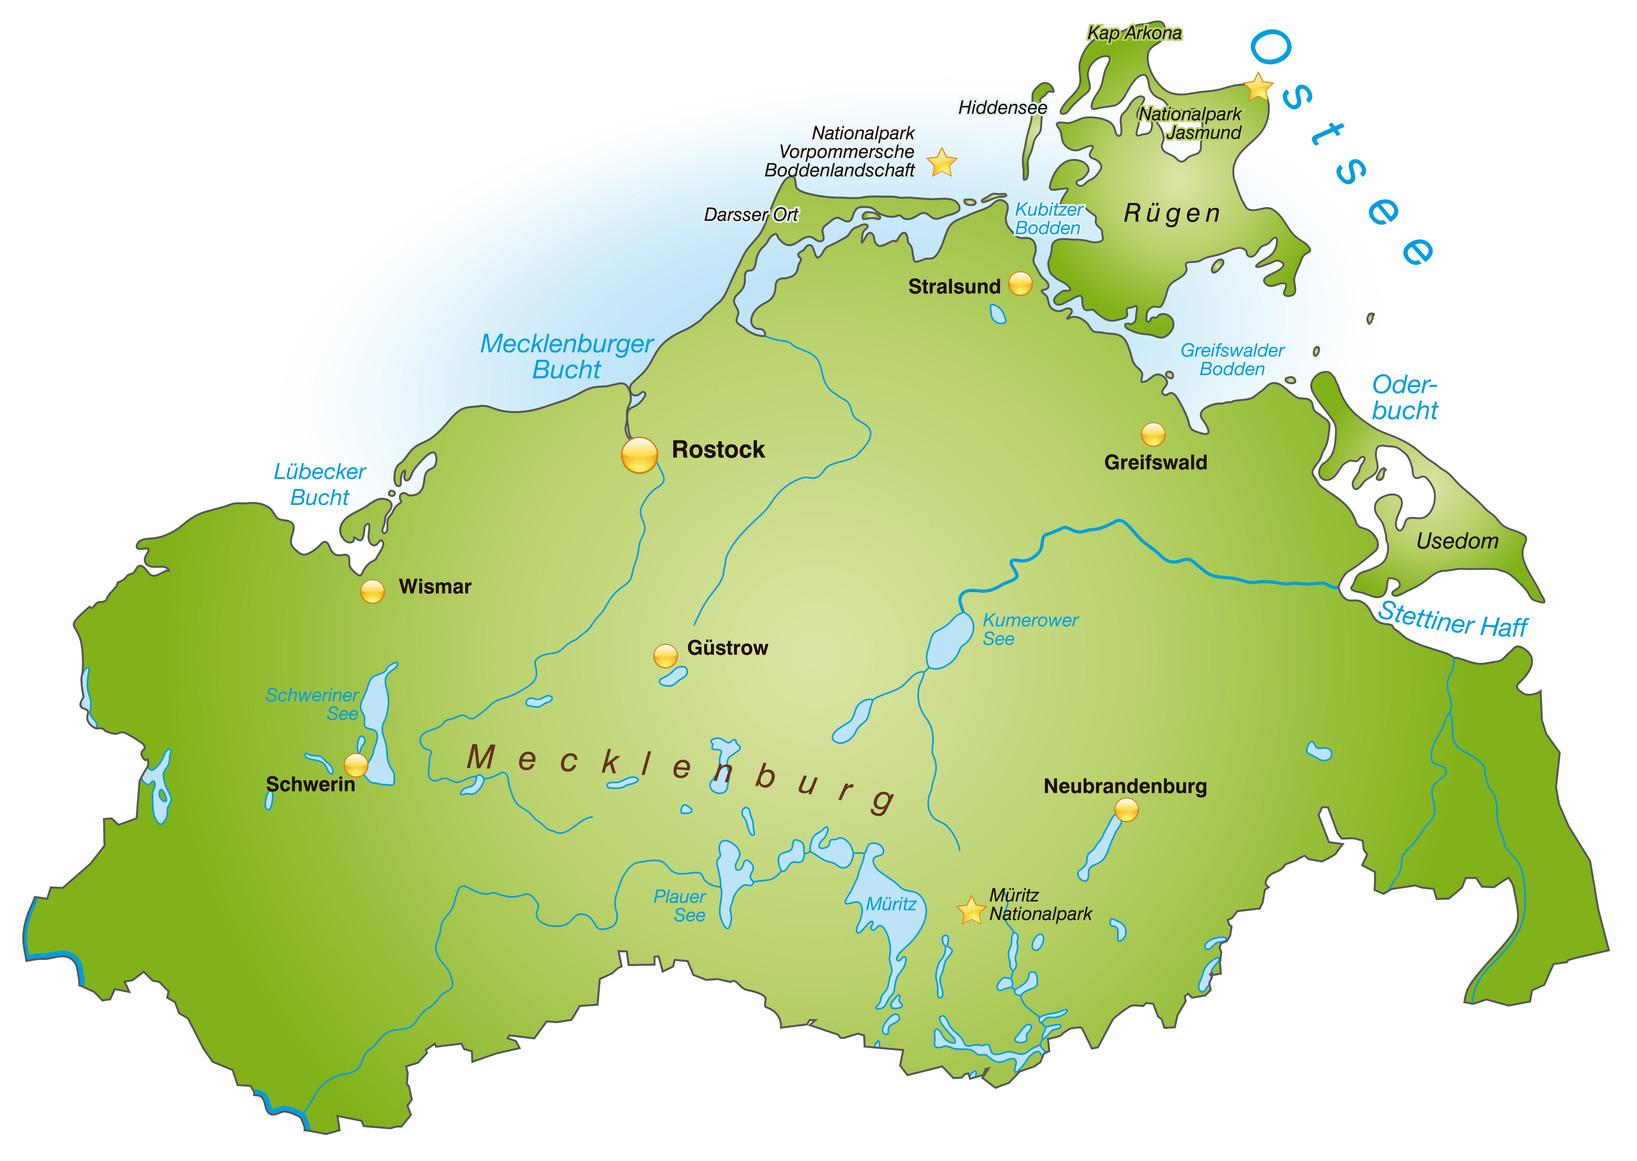 Detektei Mecklenburg-Vorpommern - Kurtz Detektei Rostock